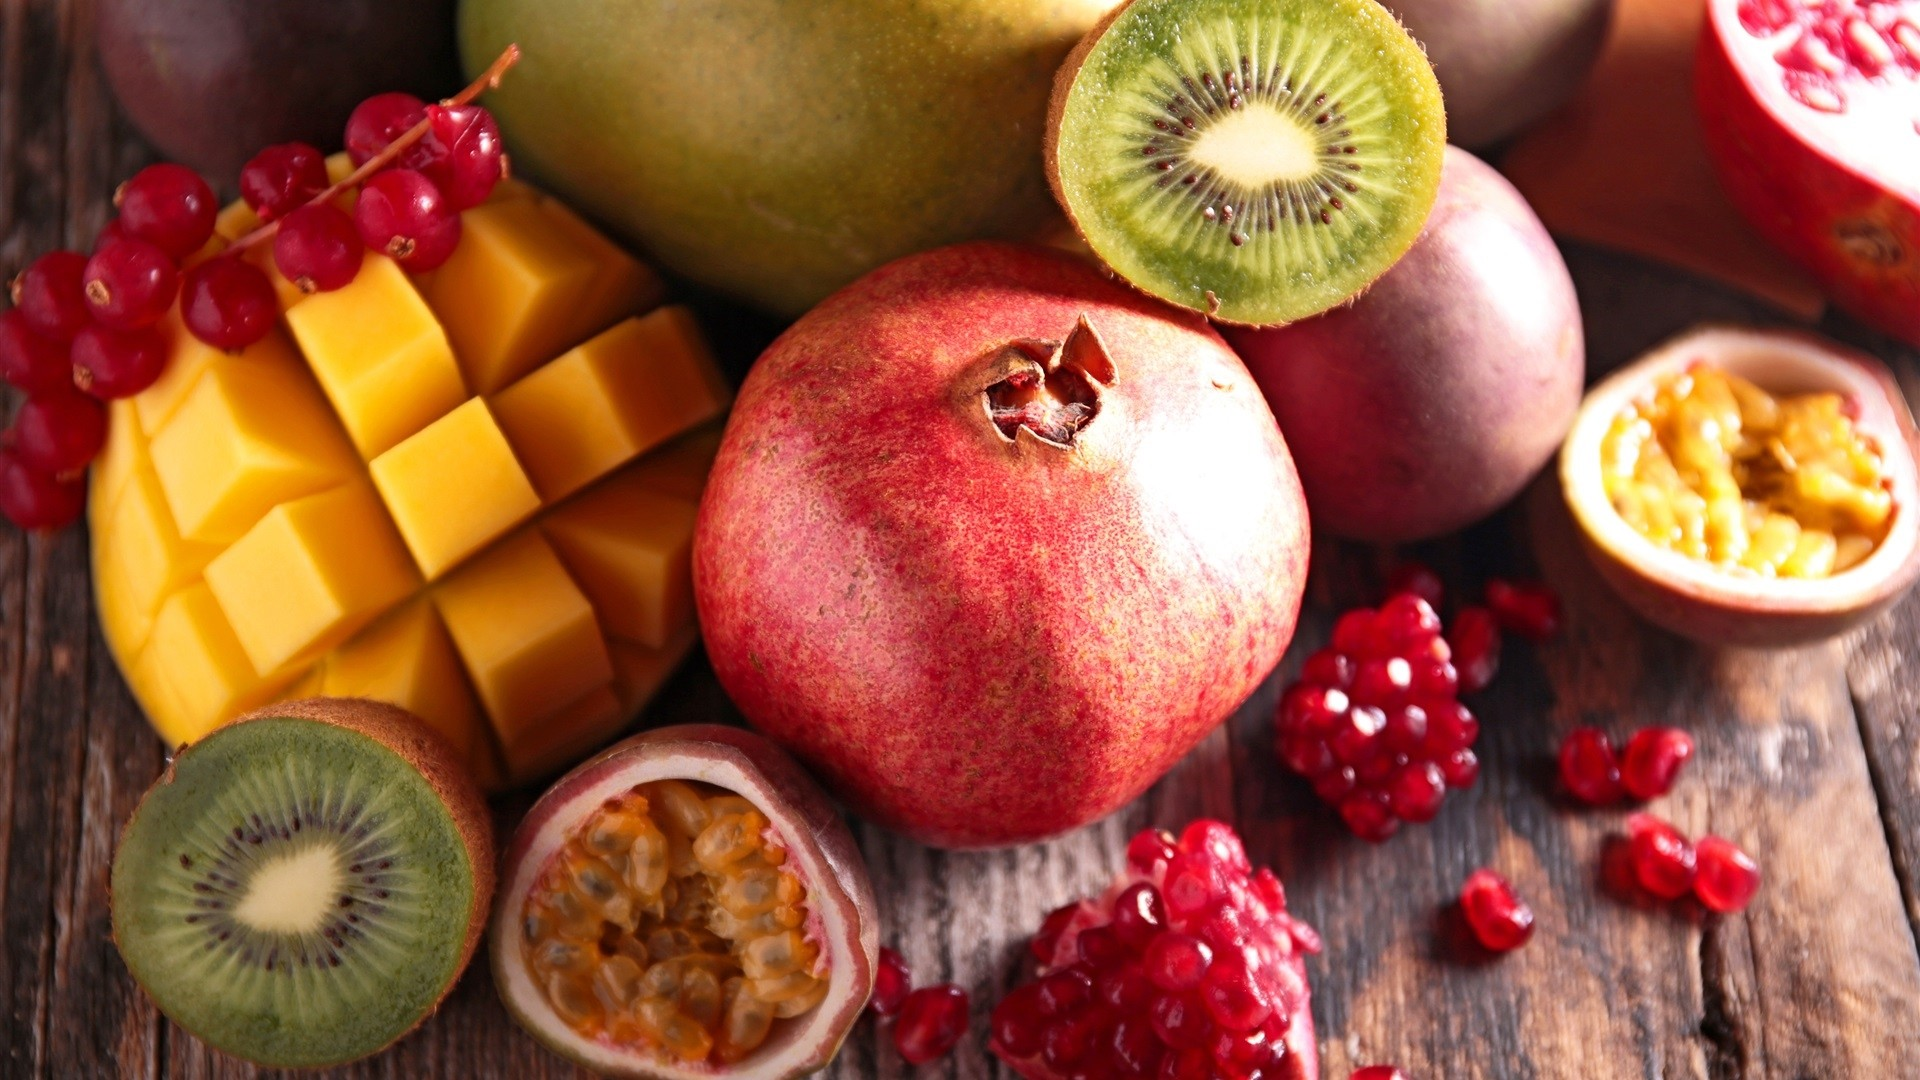 Fruit computer wallpaper